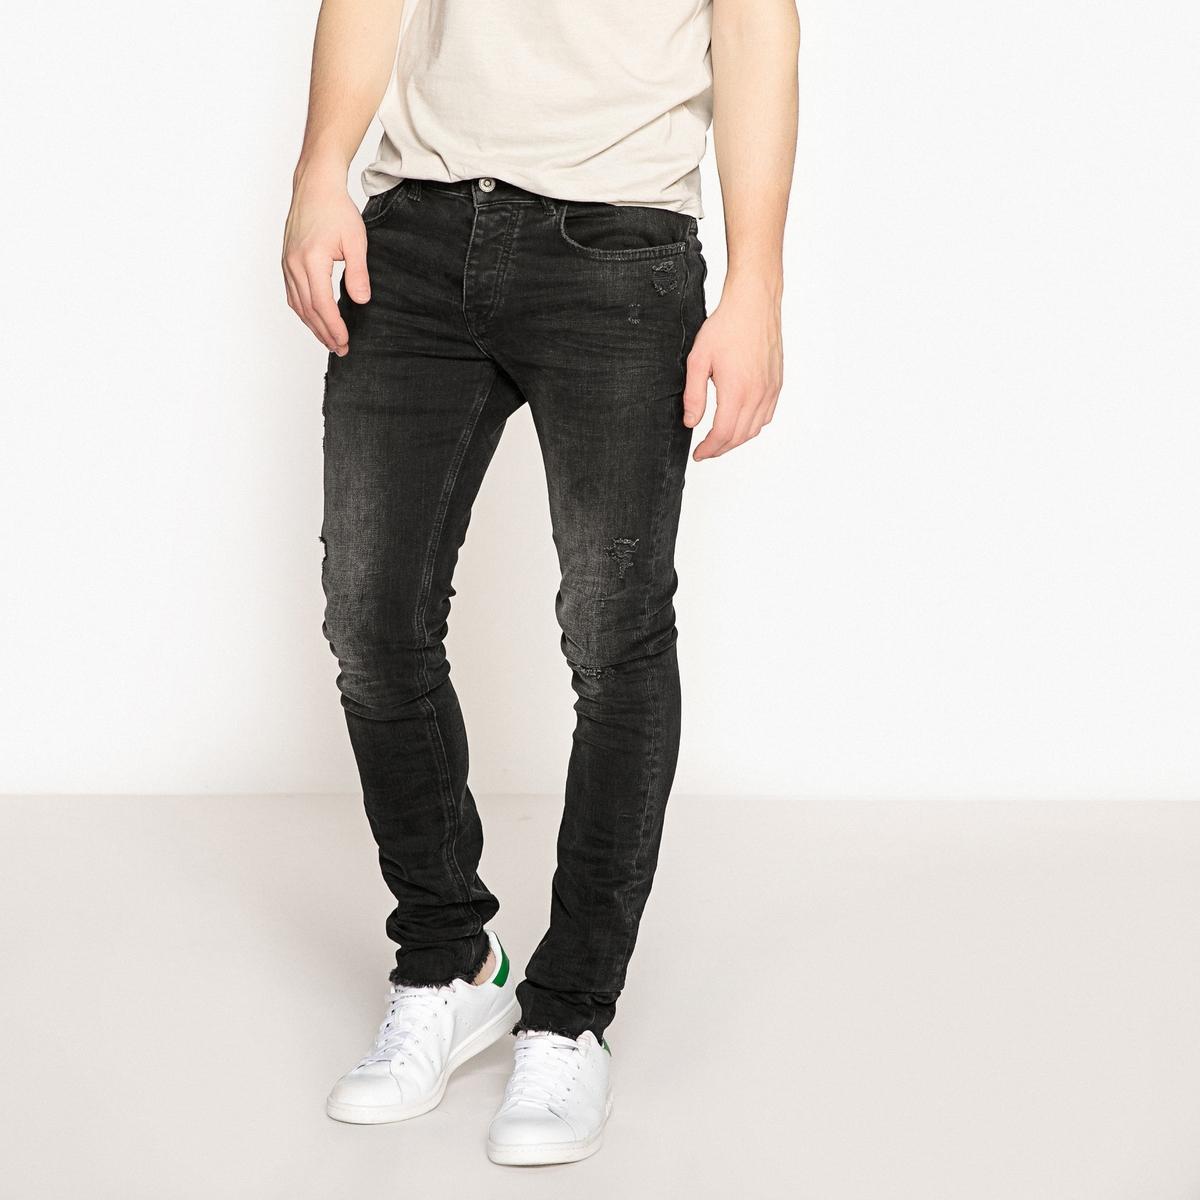 Jeans slim, base desfiada